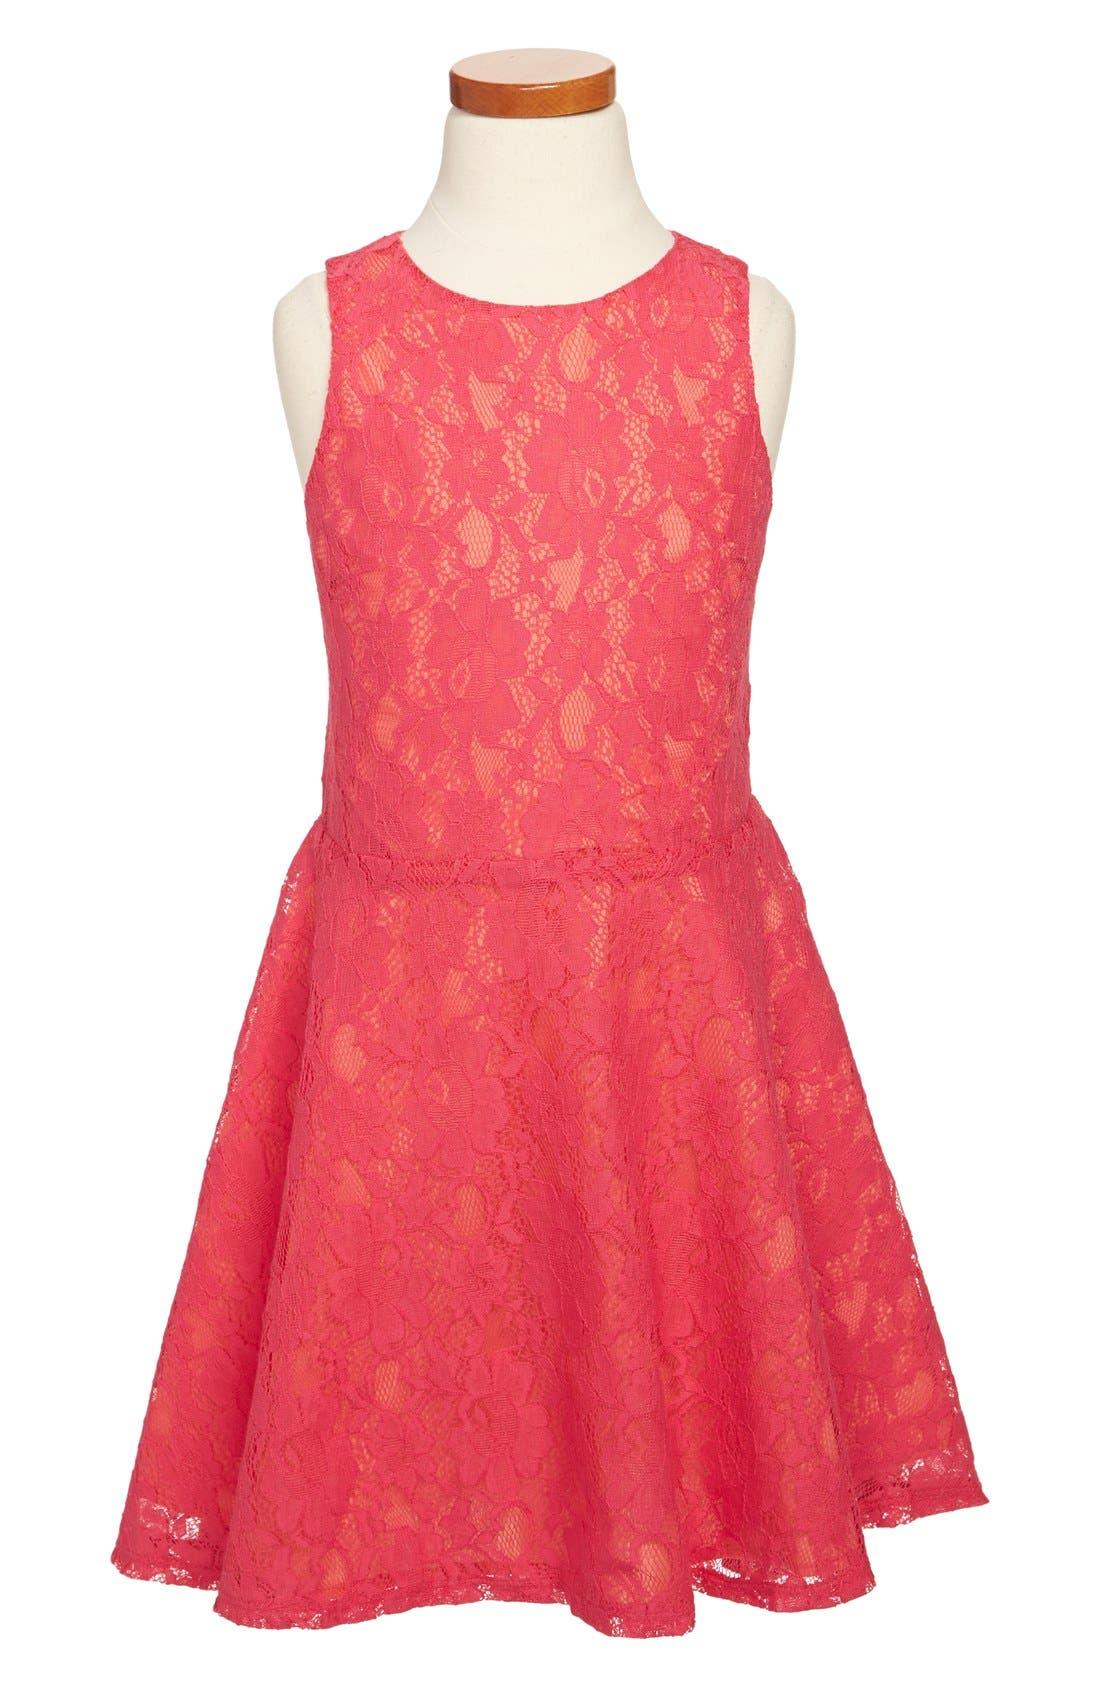 Alternate Image 1 Selected - Miss Behave 'Sofia' Lace Dress (Big Girls)